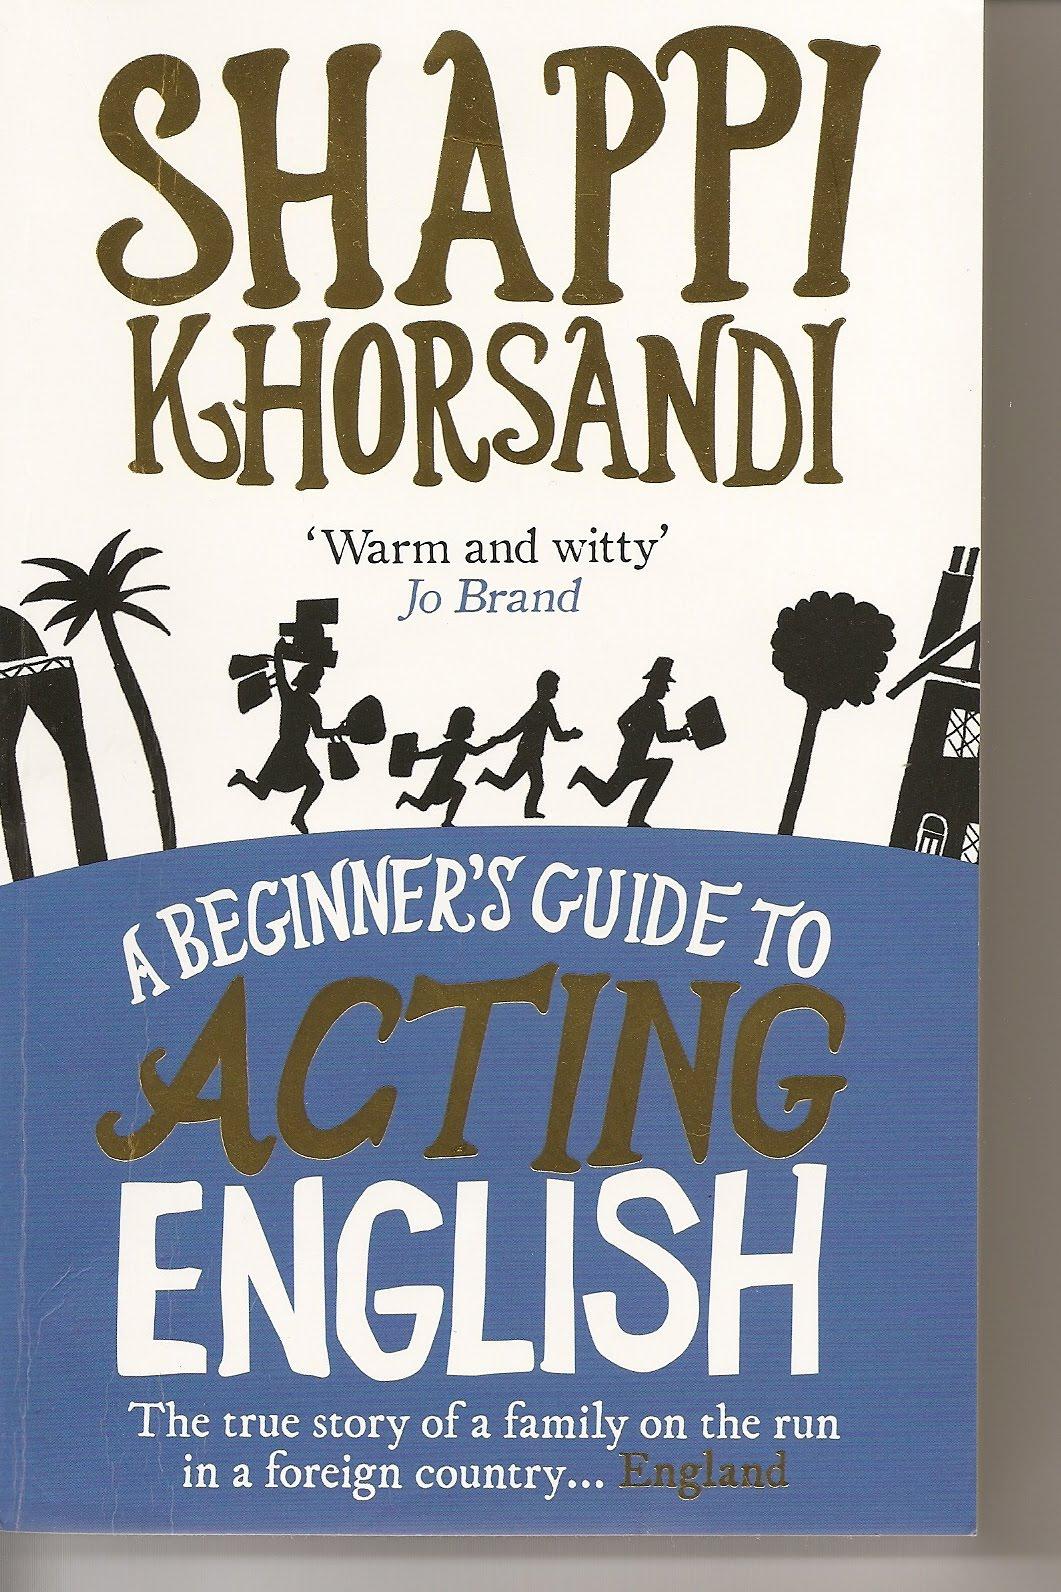 tiny library a beginner s guide to acting english by shappi khorsandi rh tinylibrary blogspot com a beginner's guide to acting english pdf a beginner's guide to acting english pdf